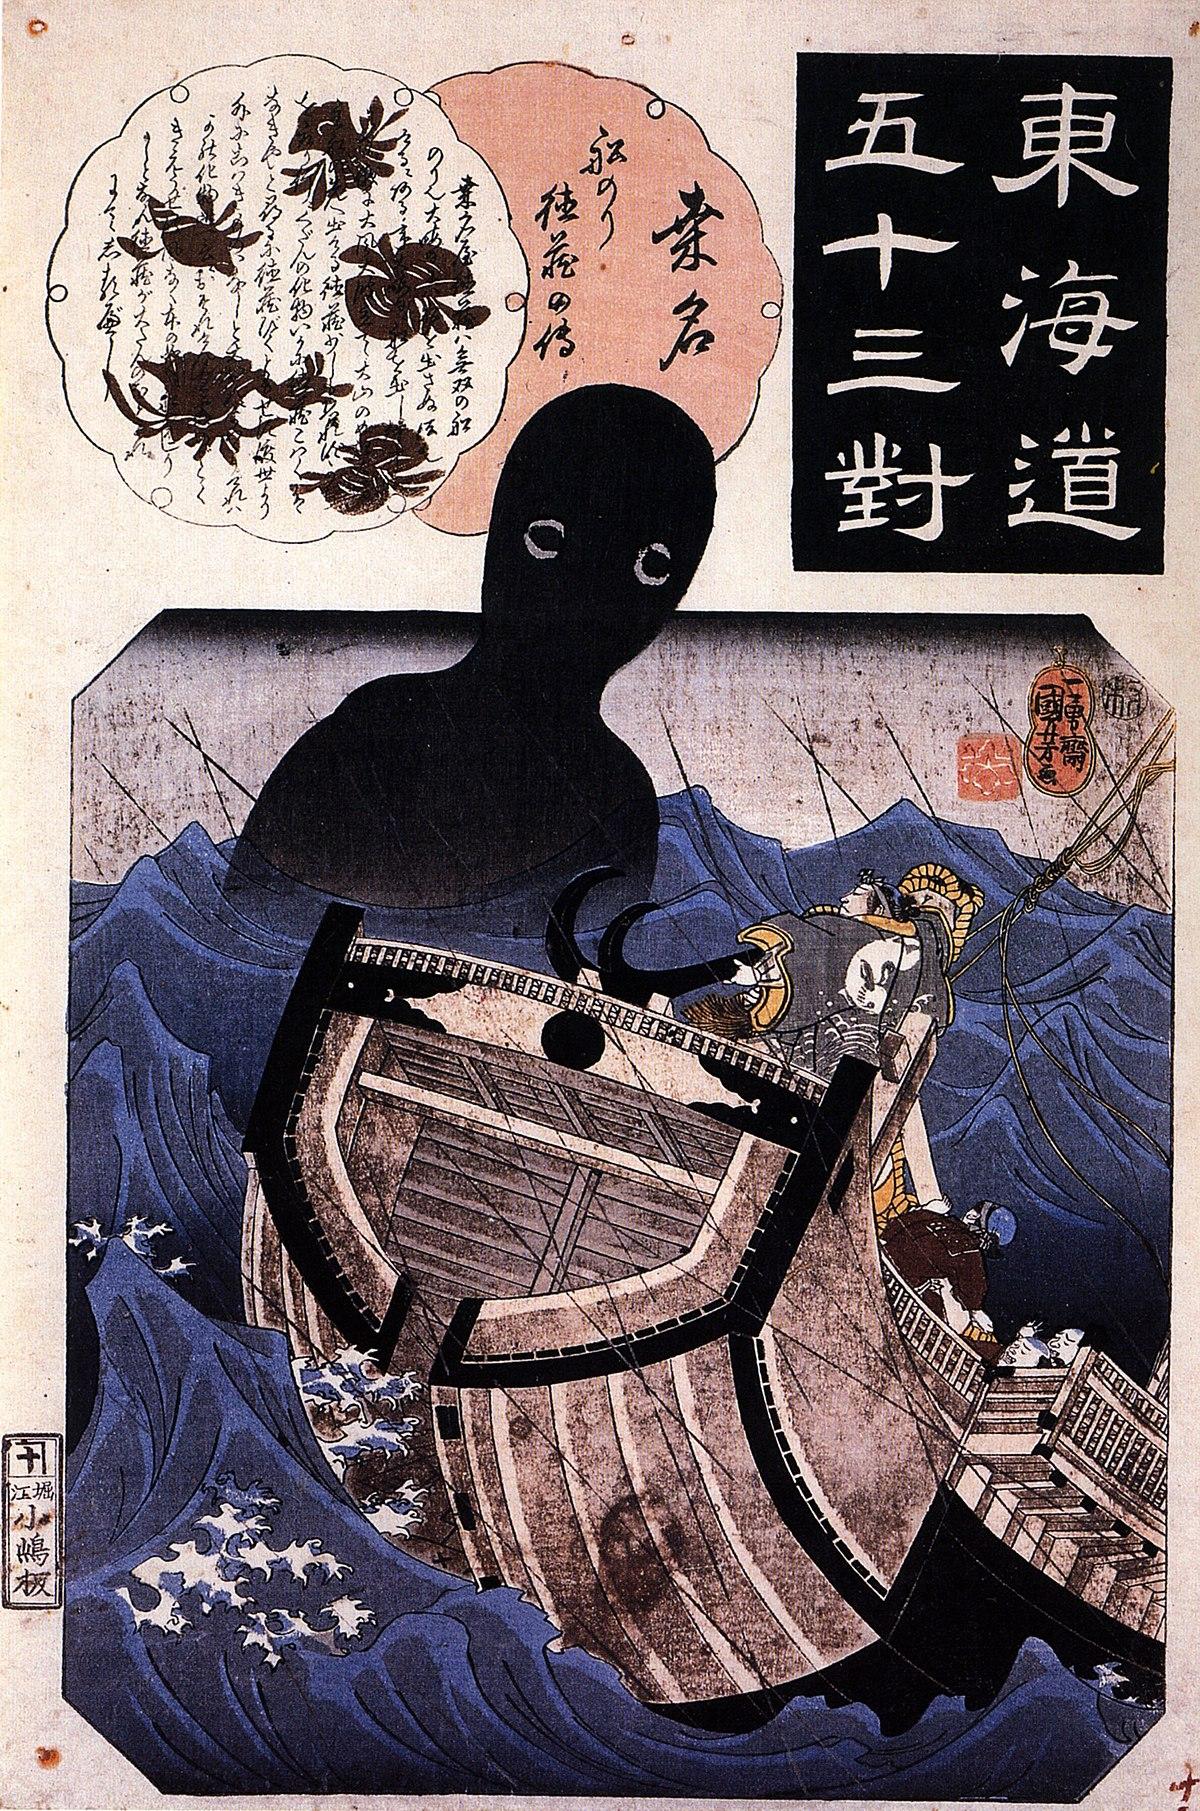 [Obrazek: 1200px-Kuwana_-_The_sailor_Tokuso_and_th...onster.jpg]